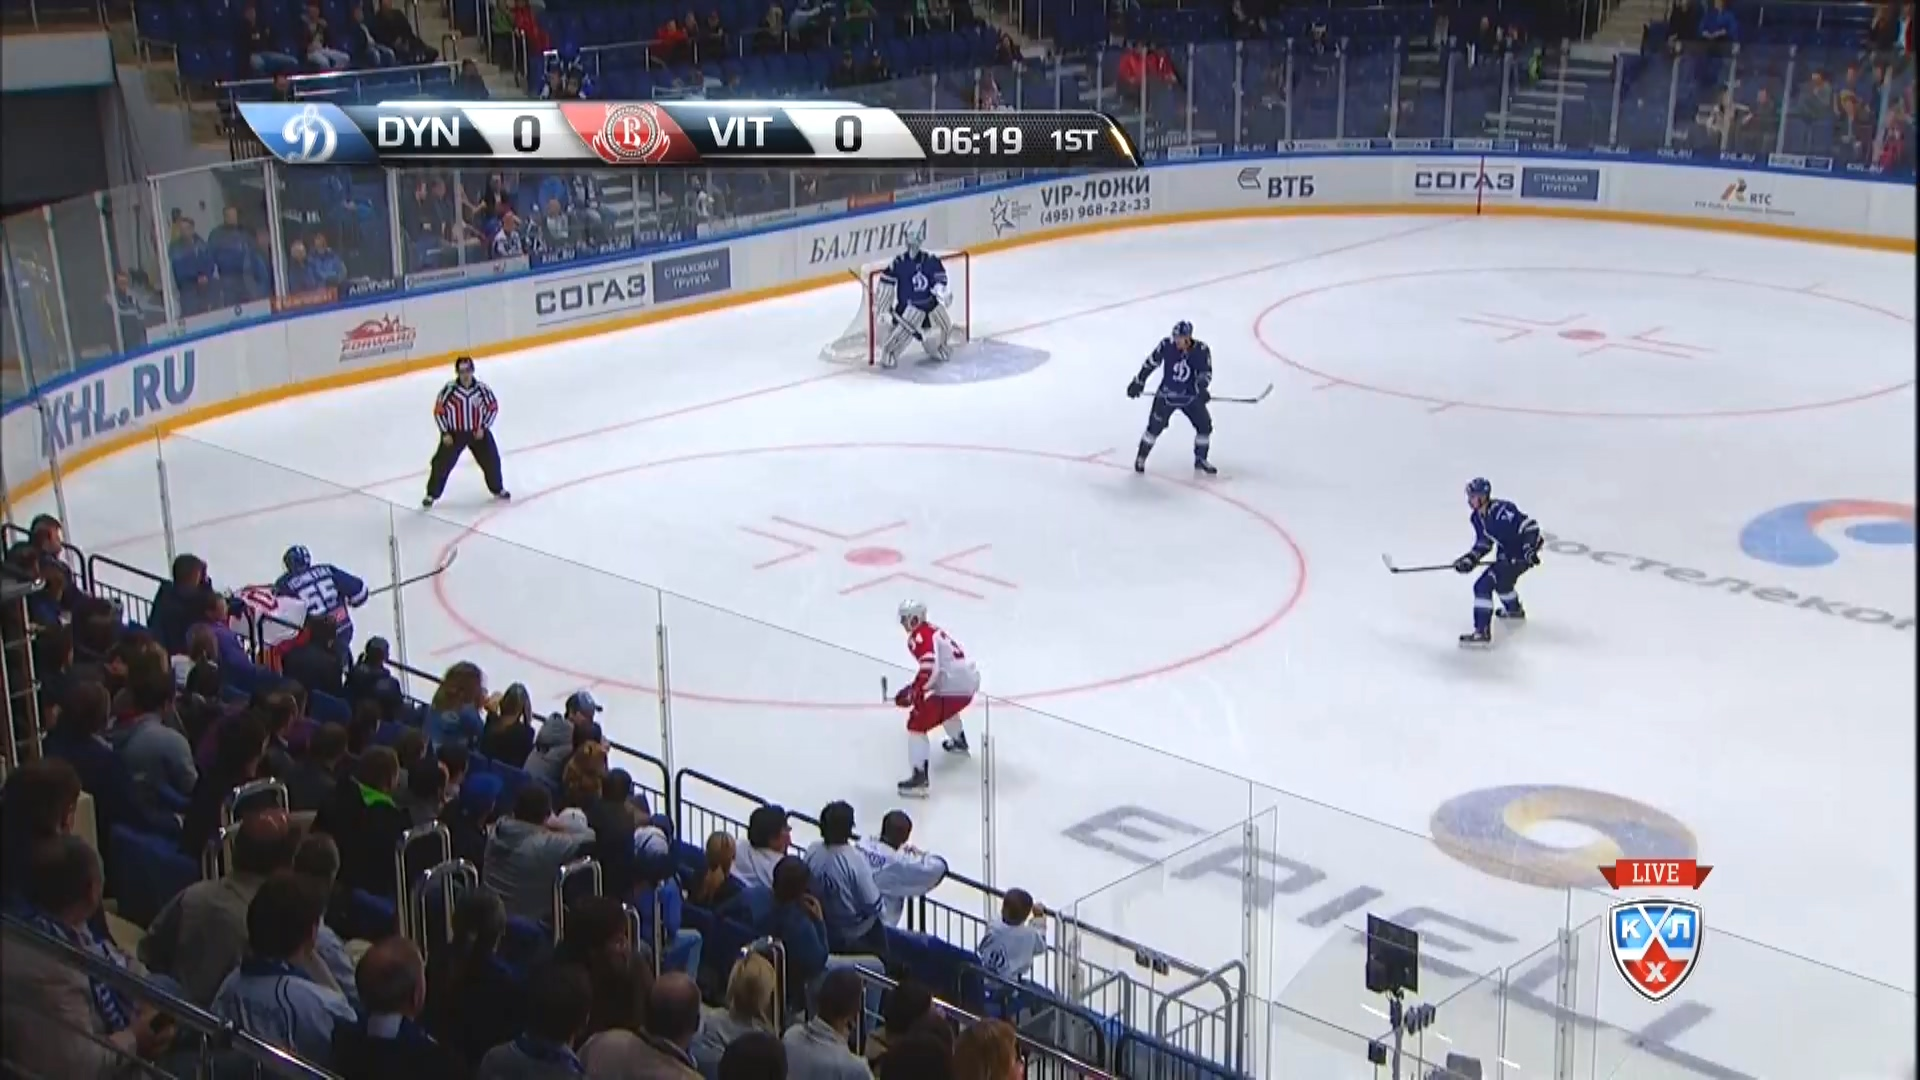 KHL.2015.09.04.DynM@Vityaz.1080p25.mkv_20150905_154808.593.jpg